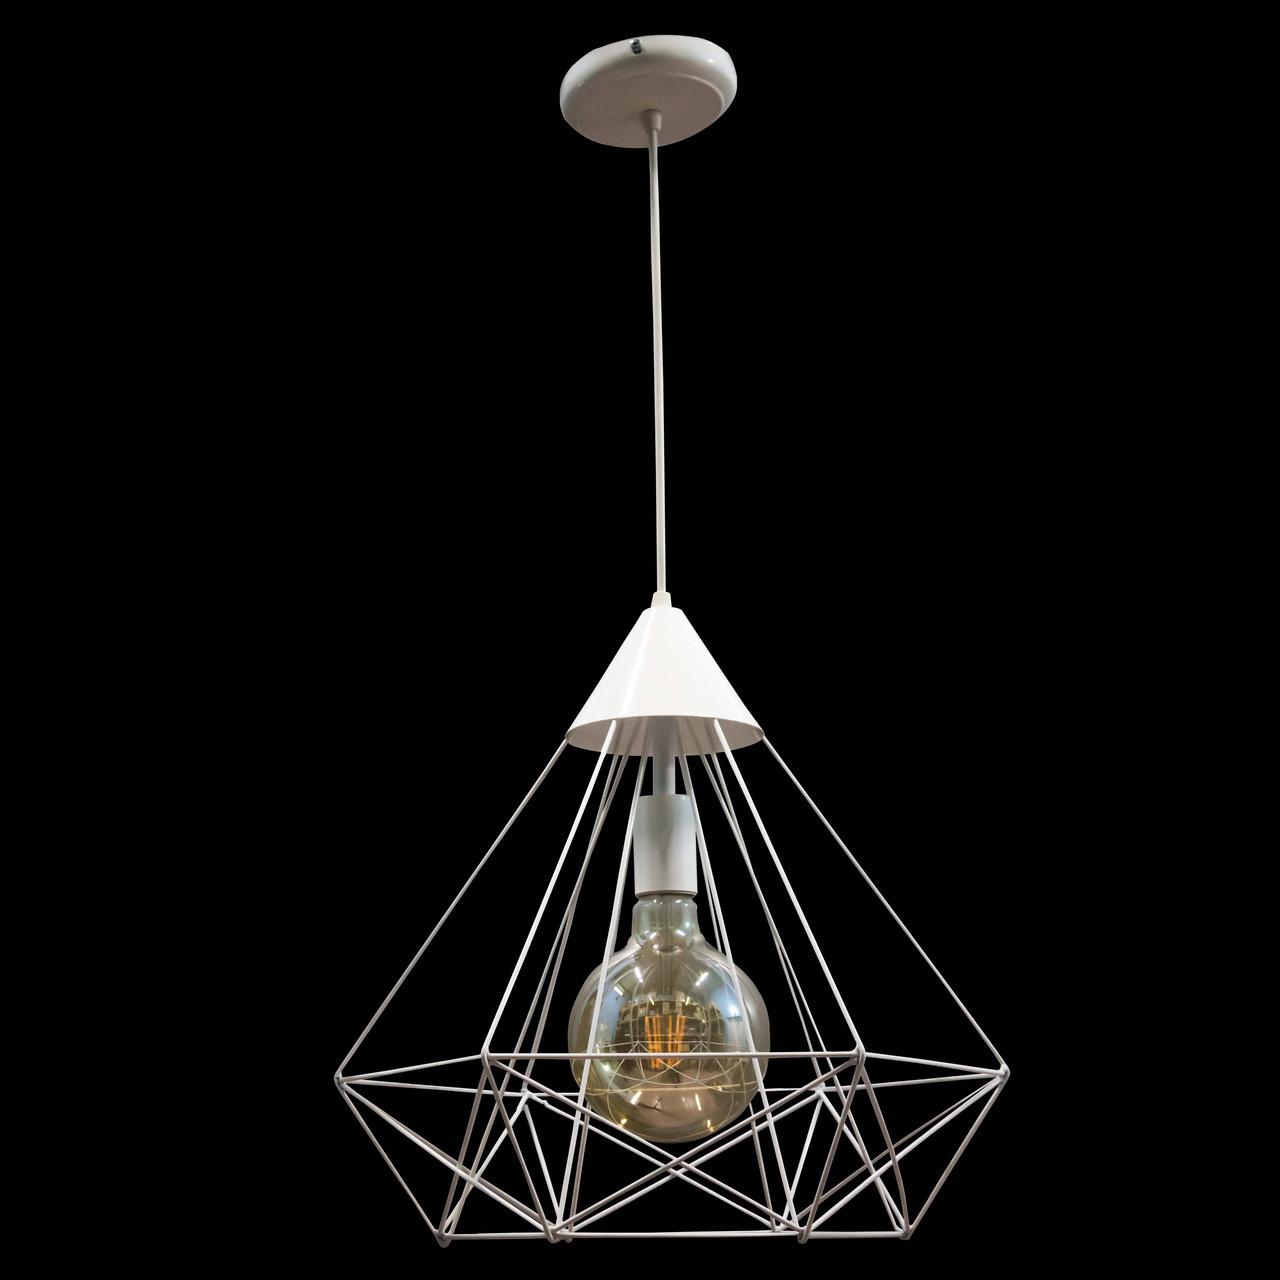 Светильник подвесной в стиле лофт NL 0541 W MSK Electric